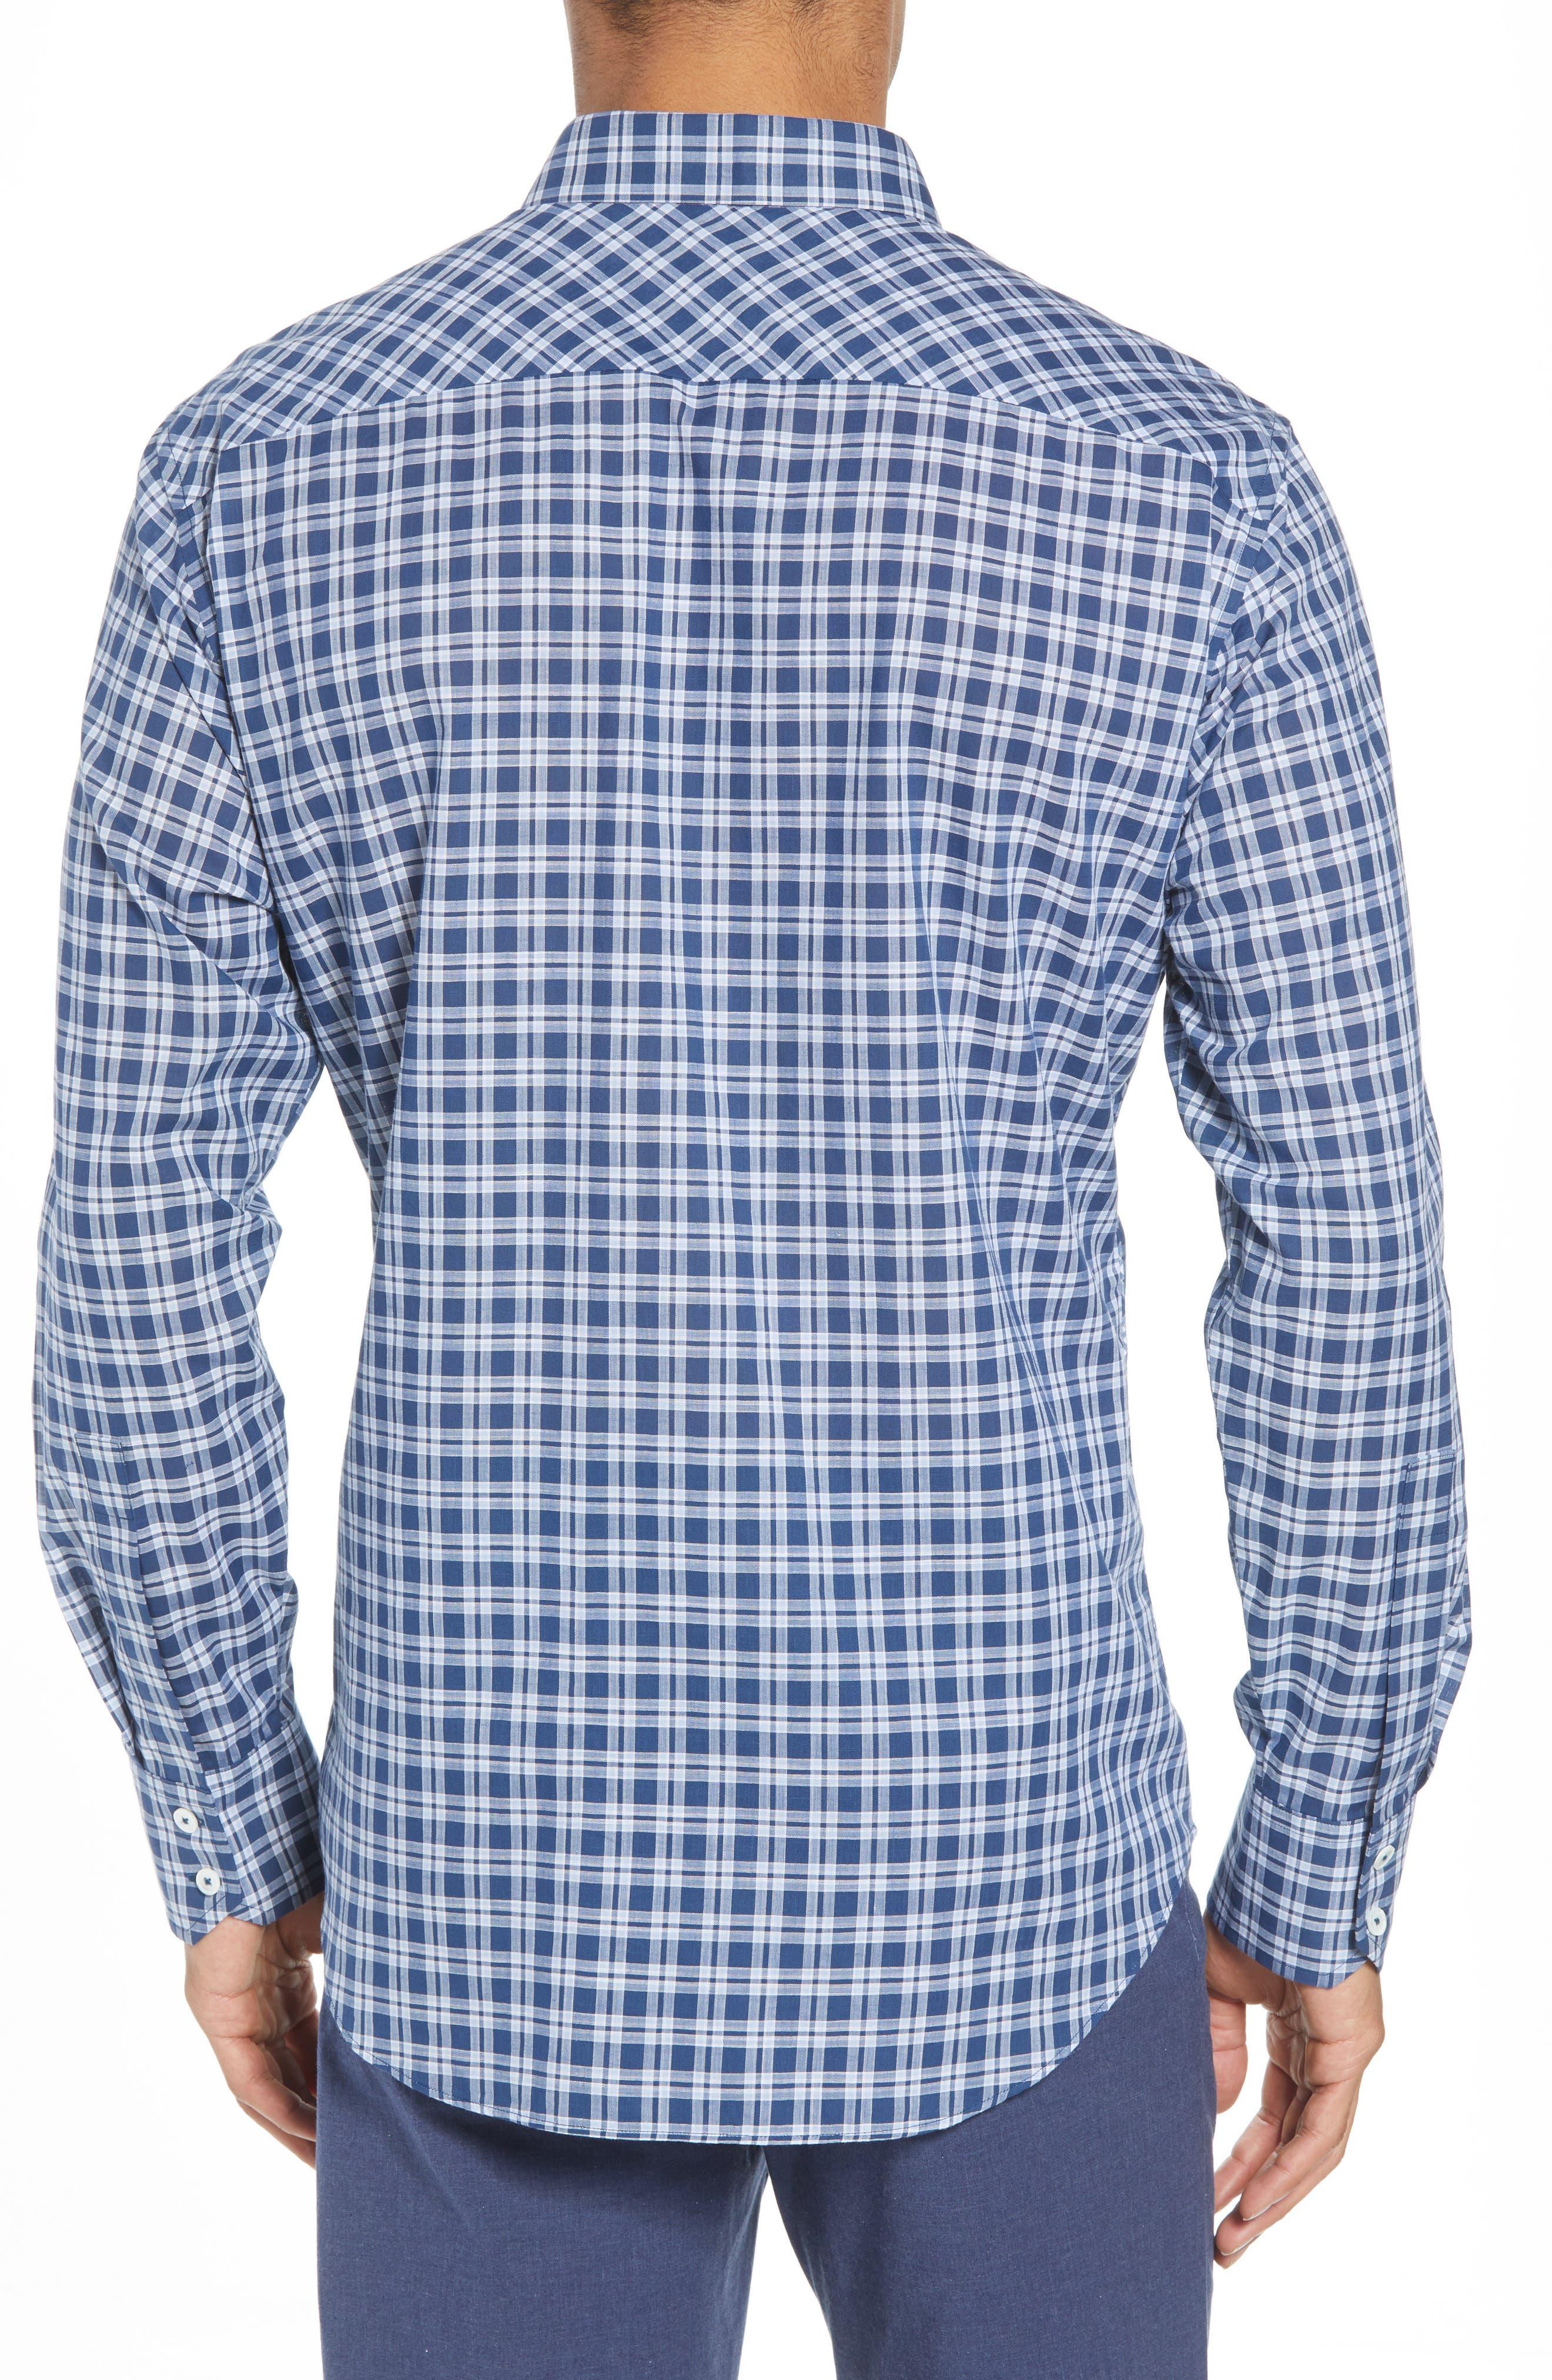 Speer Regular Fit Sport Shirt,                             Alternate thumbnail 2, color,                             Indigo